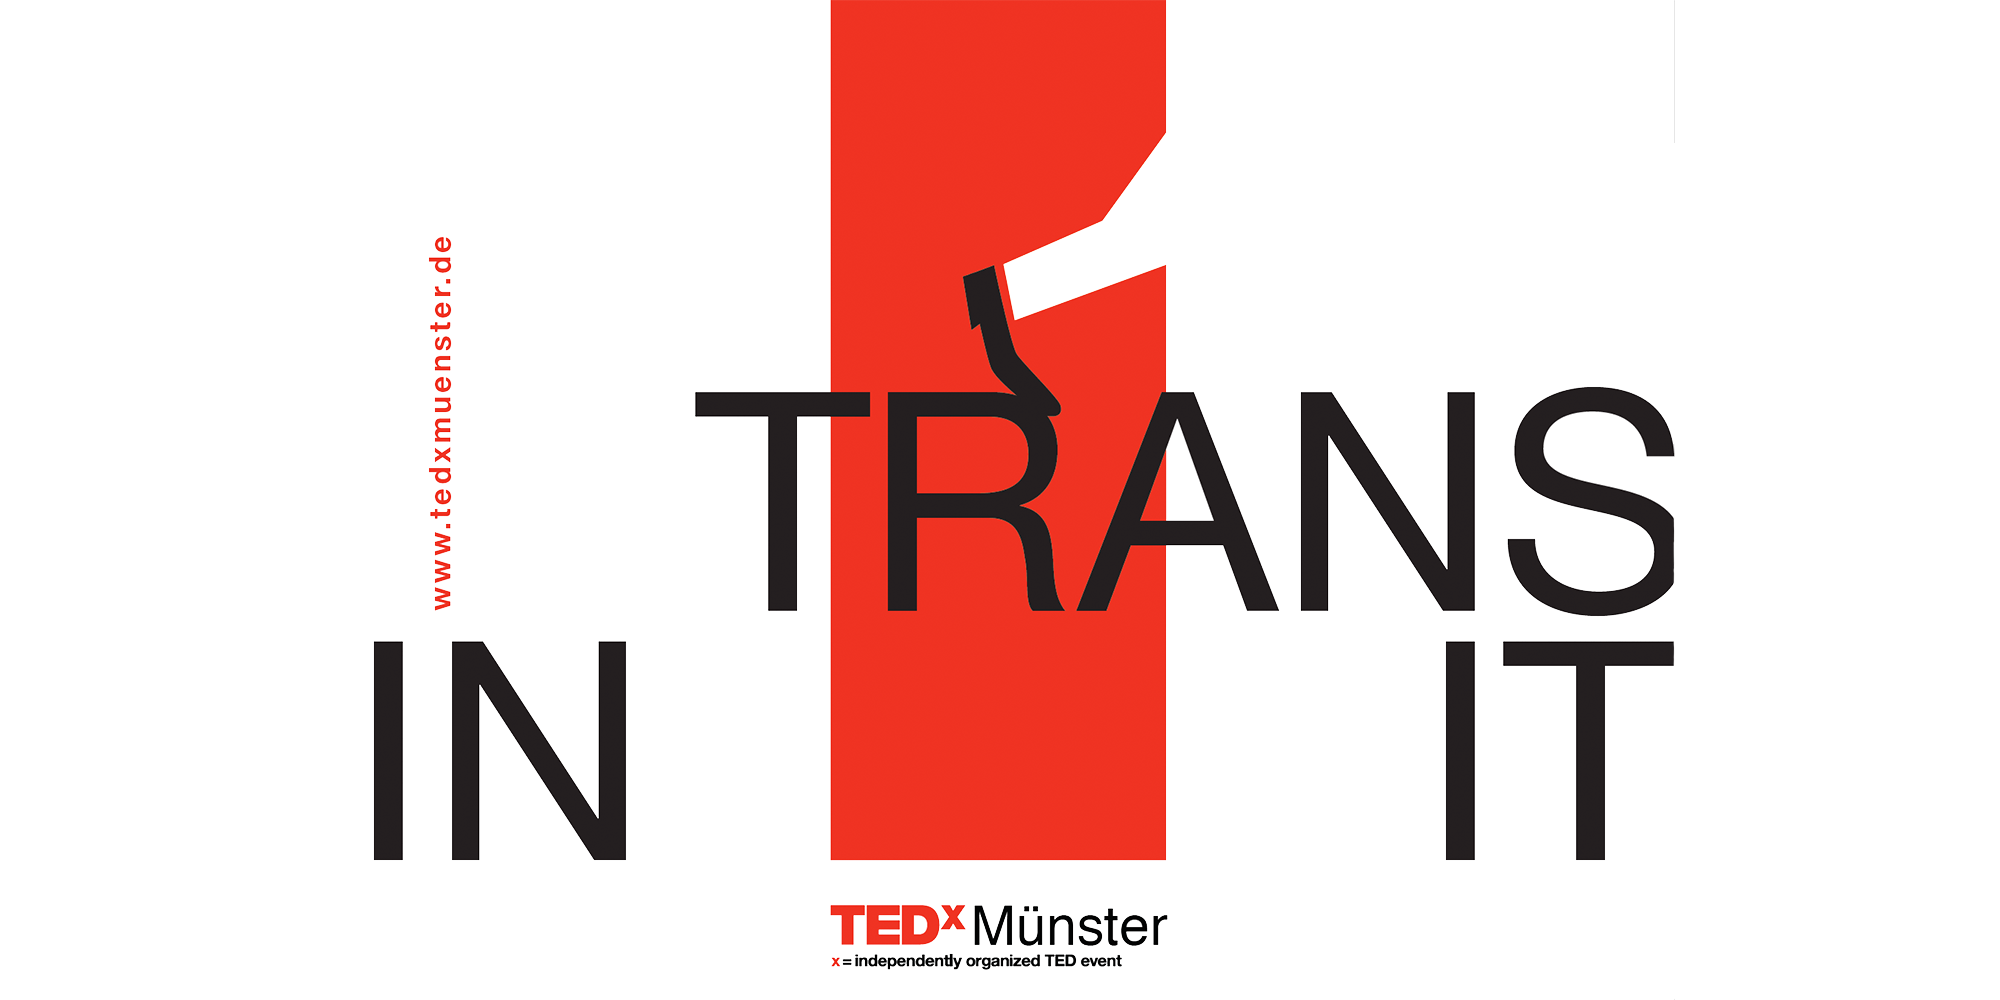 TEDxMuenster_IN_transit_2021